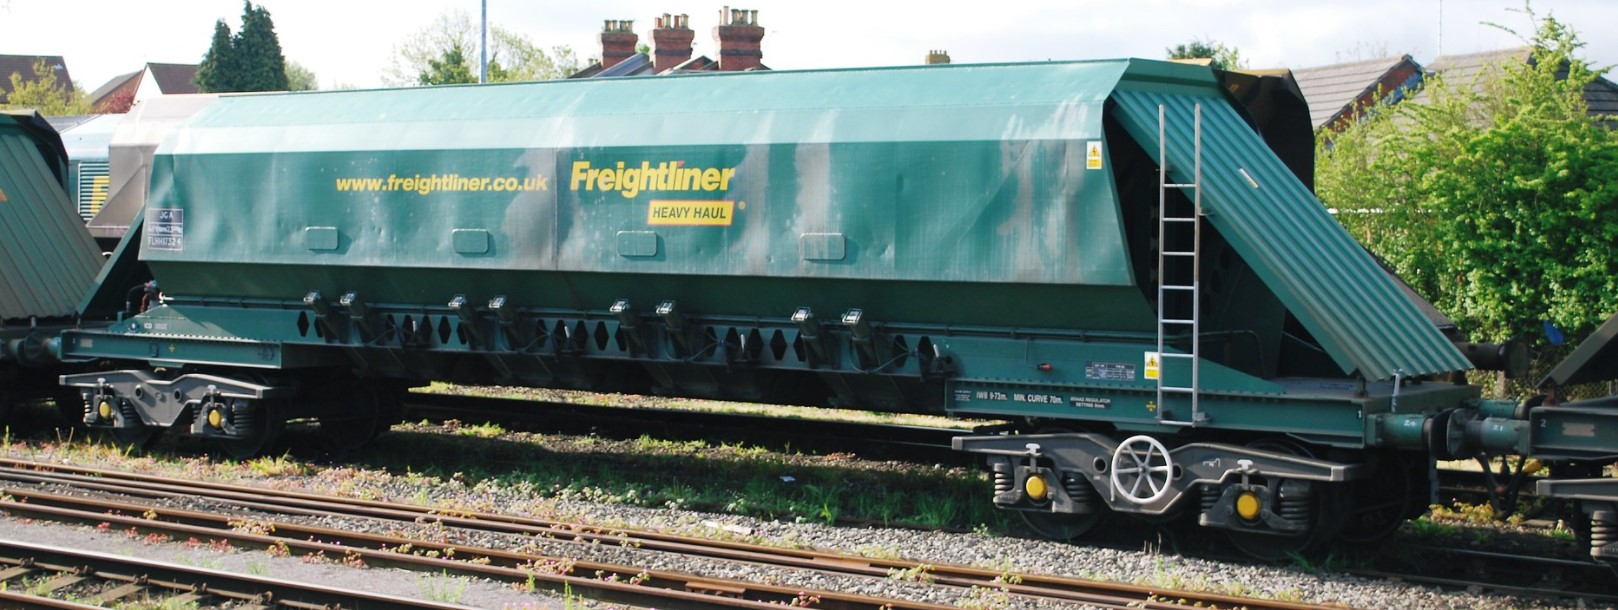 FLHH 17324 at Stoke Gifford Yard in May 2010. ©Hugh Llewelyn